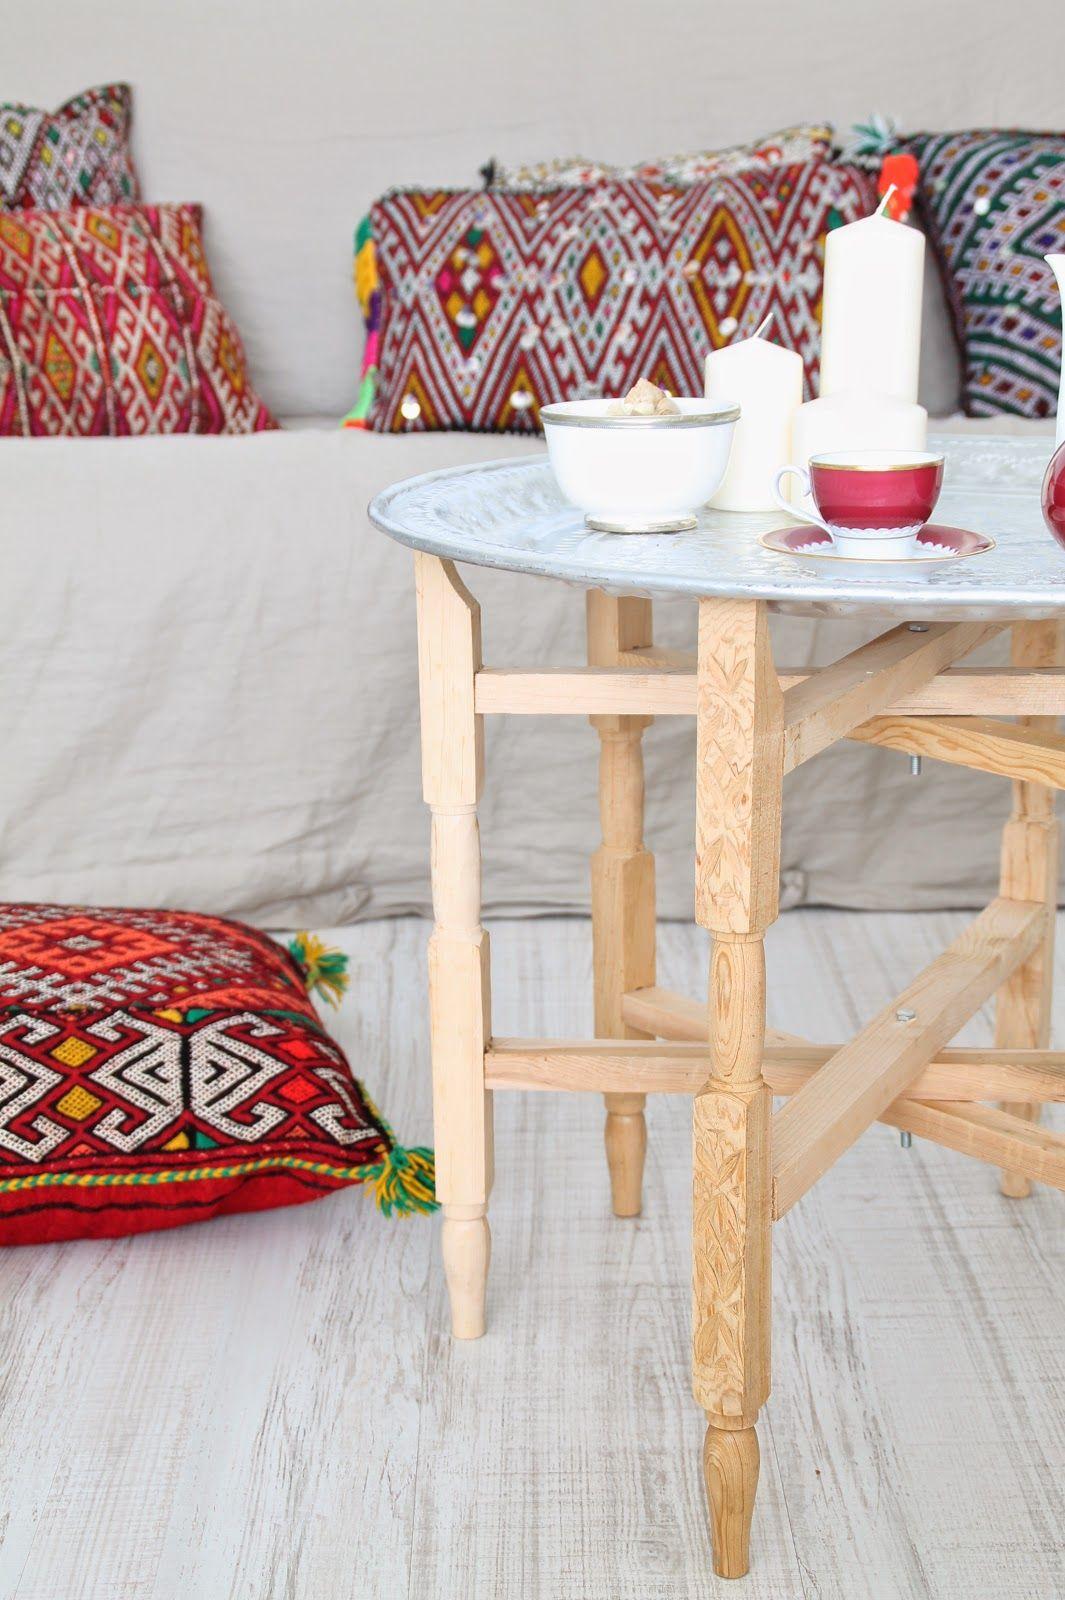 quedamos en un bazar textil. cojines bereberes. dar amína shop